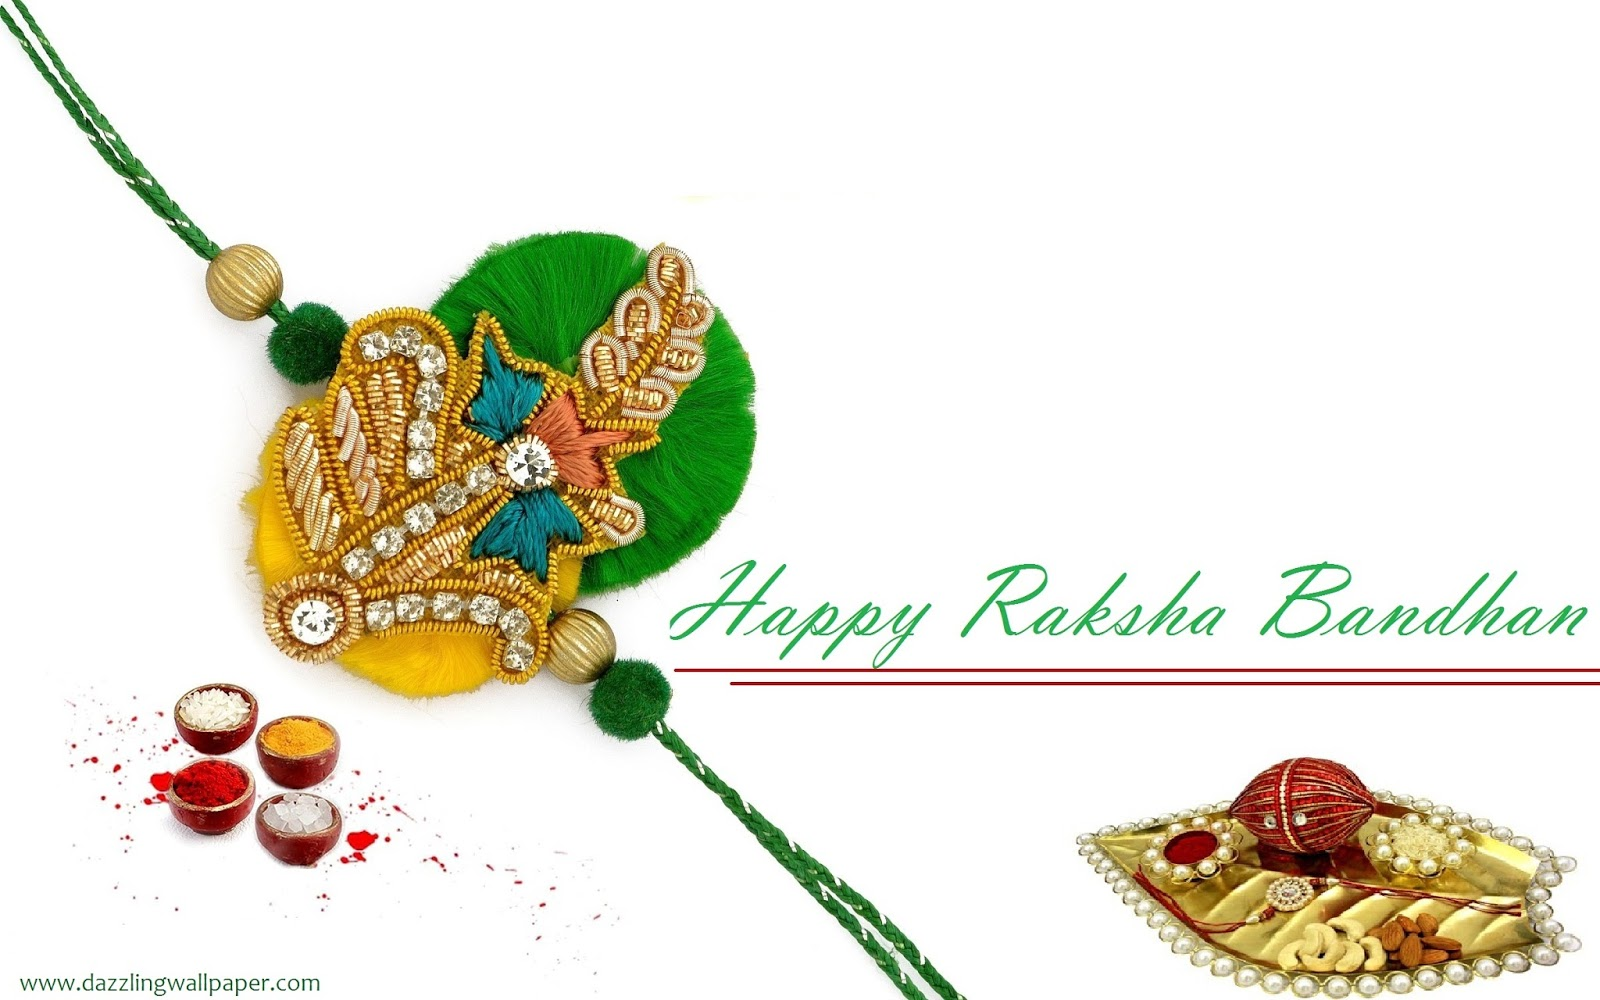 raksha bandhan, raksha bandhan images, rakhi images, happy raksha bandhan 2016 images, happy raksha bandhan images, rakhi pictures, Happy raksha bandhan pictures, Raksha Bandhan Pictures, Images for Facebook, Whatsapp, Pinterest, 50 Beautiful Raksha Bandhan Greetings Cards and Wallpapers